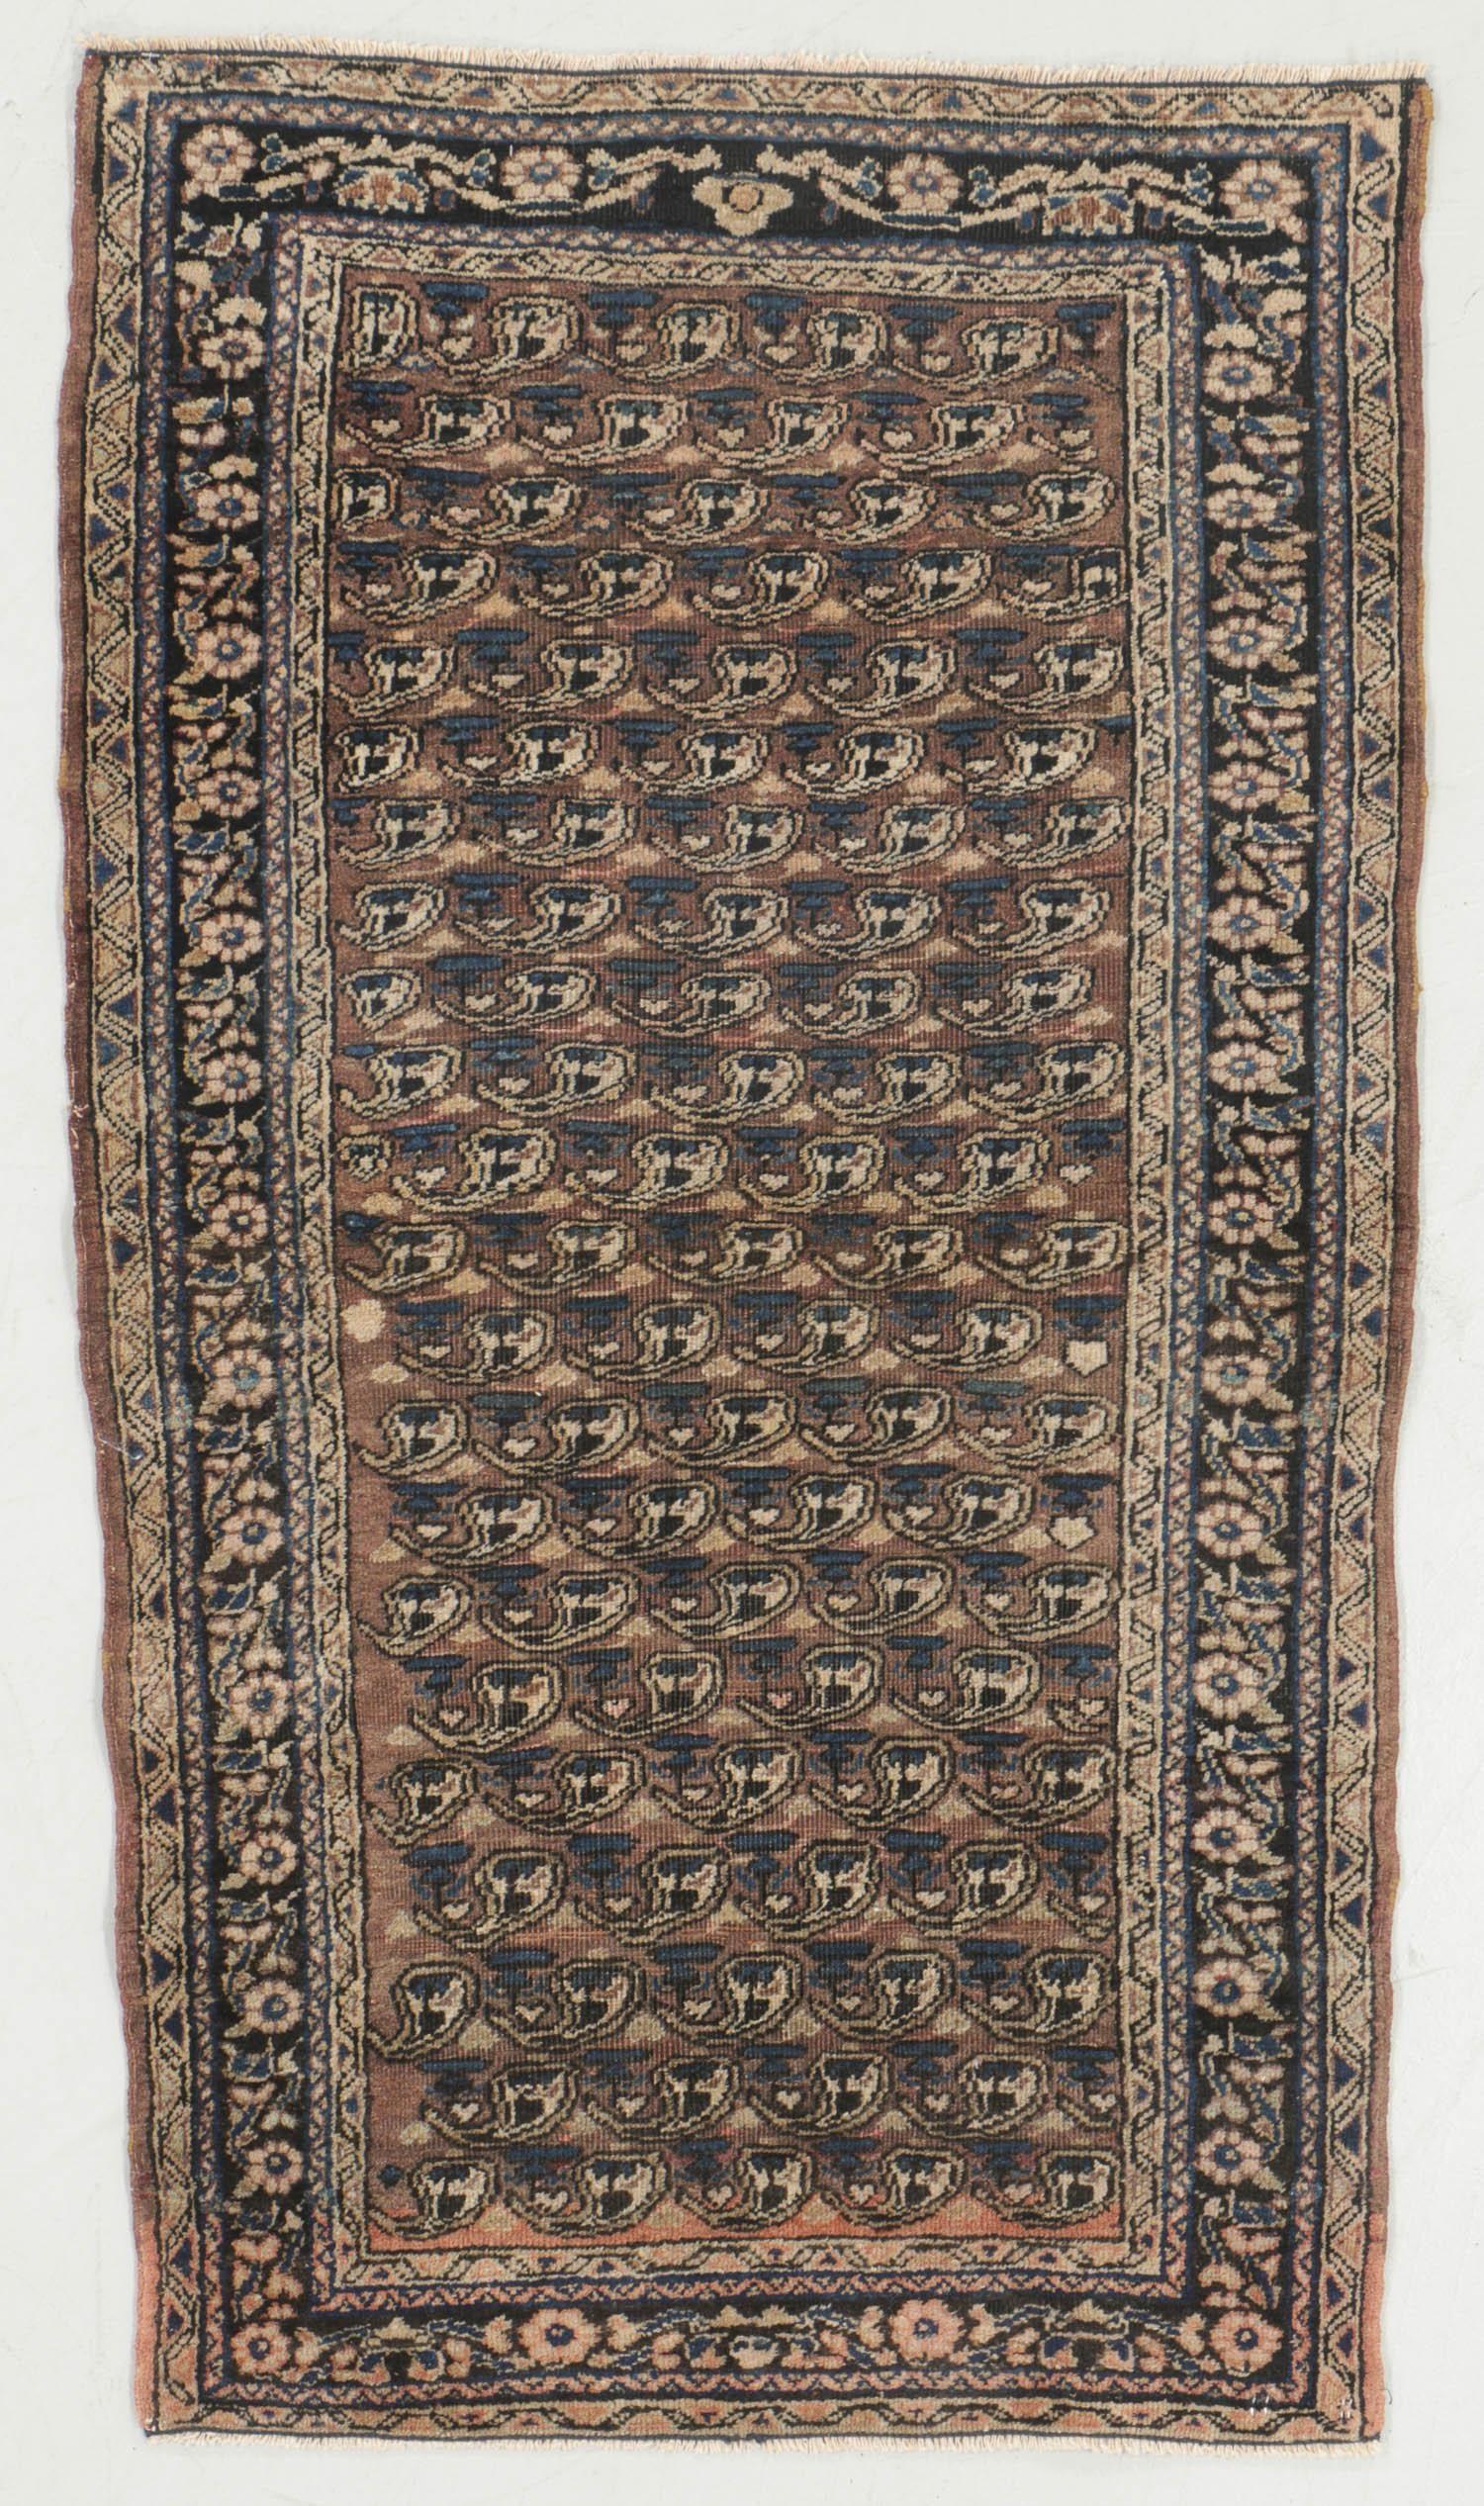 Antique Boteh Pattern Rug, Persia: 2'5'' x 4'3''